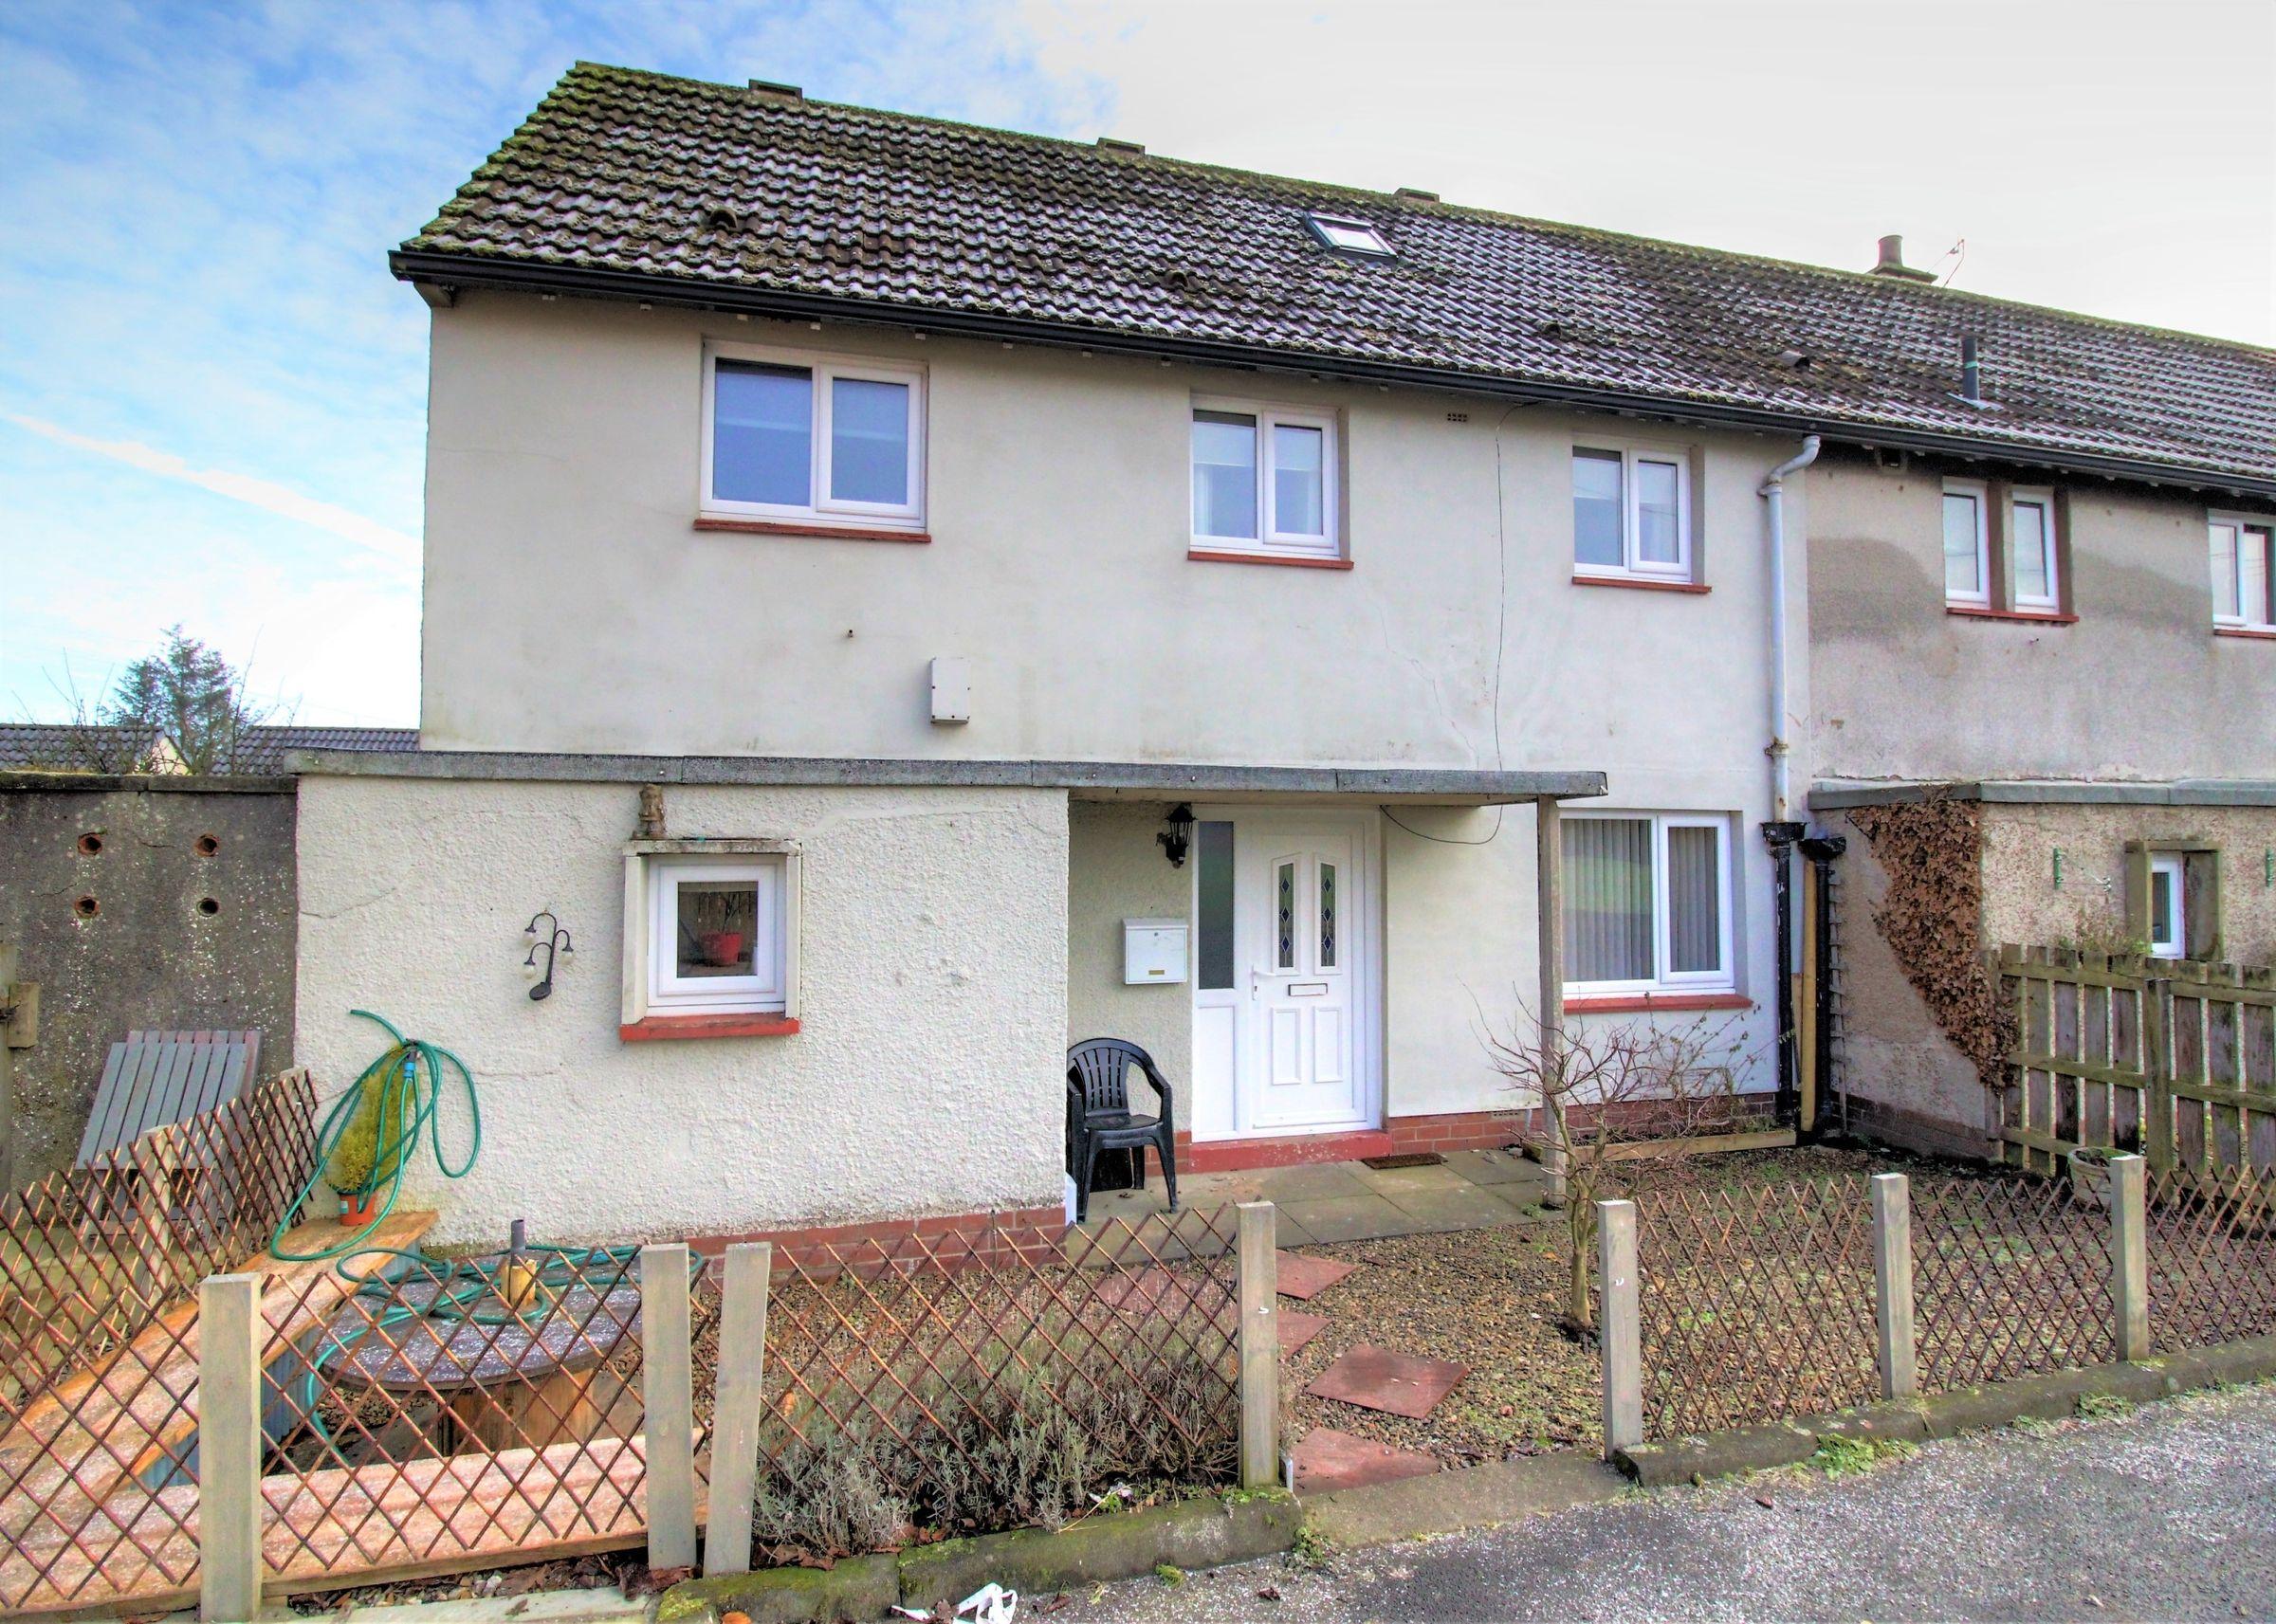 Property photo 1 of 28. Photo #1